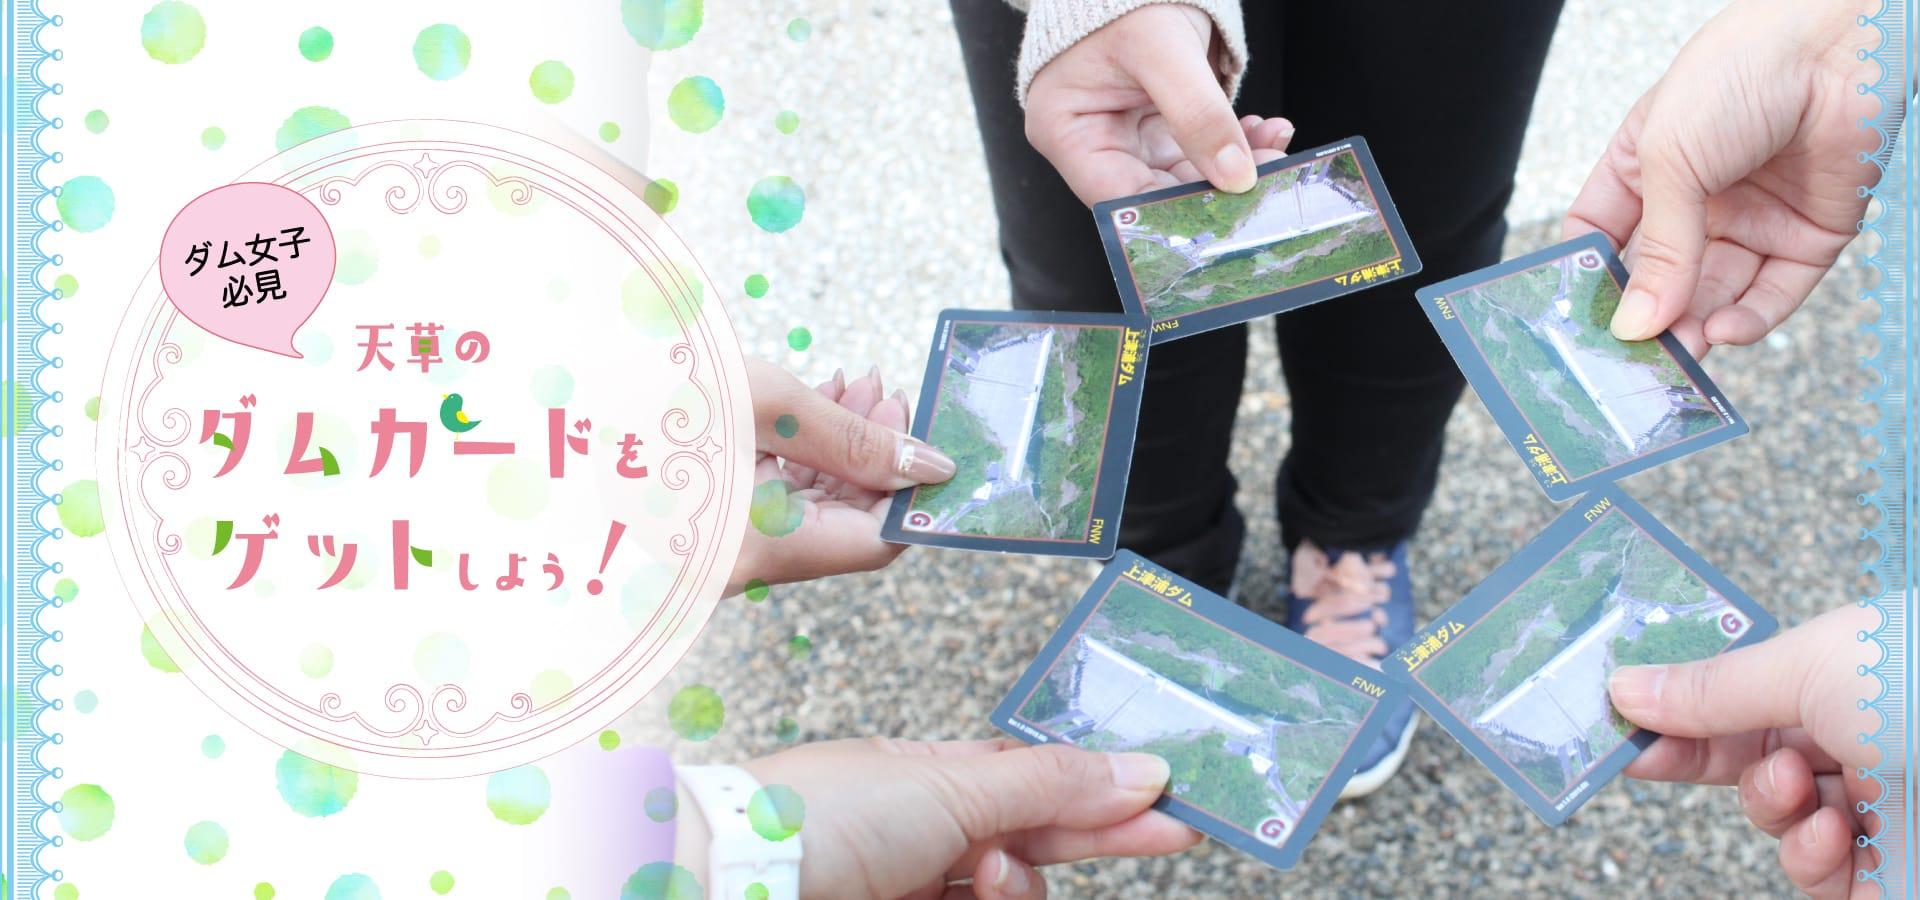 Let's get dumb card of Amakusa girl trip Amakusa!